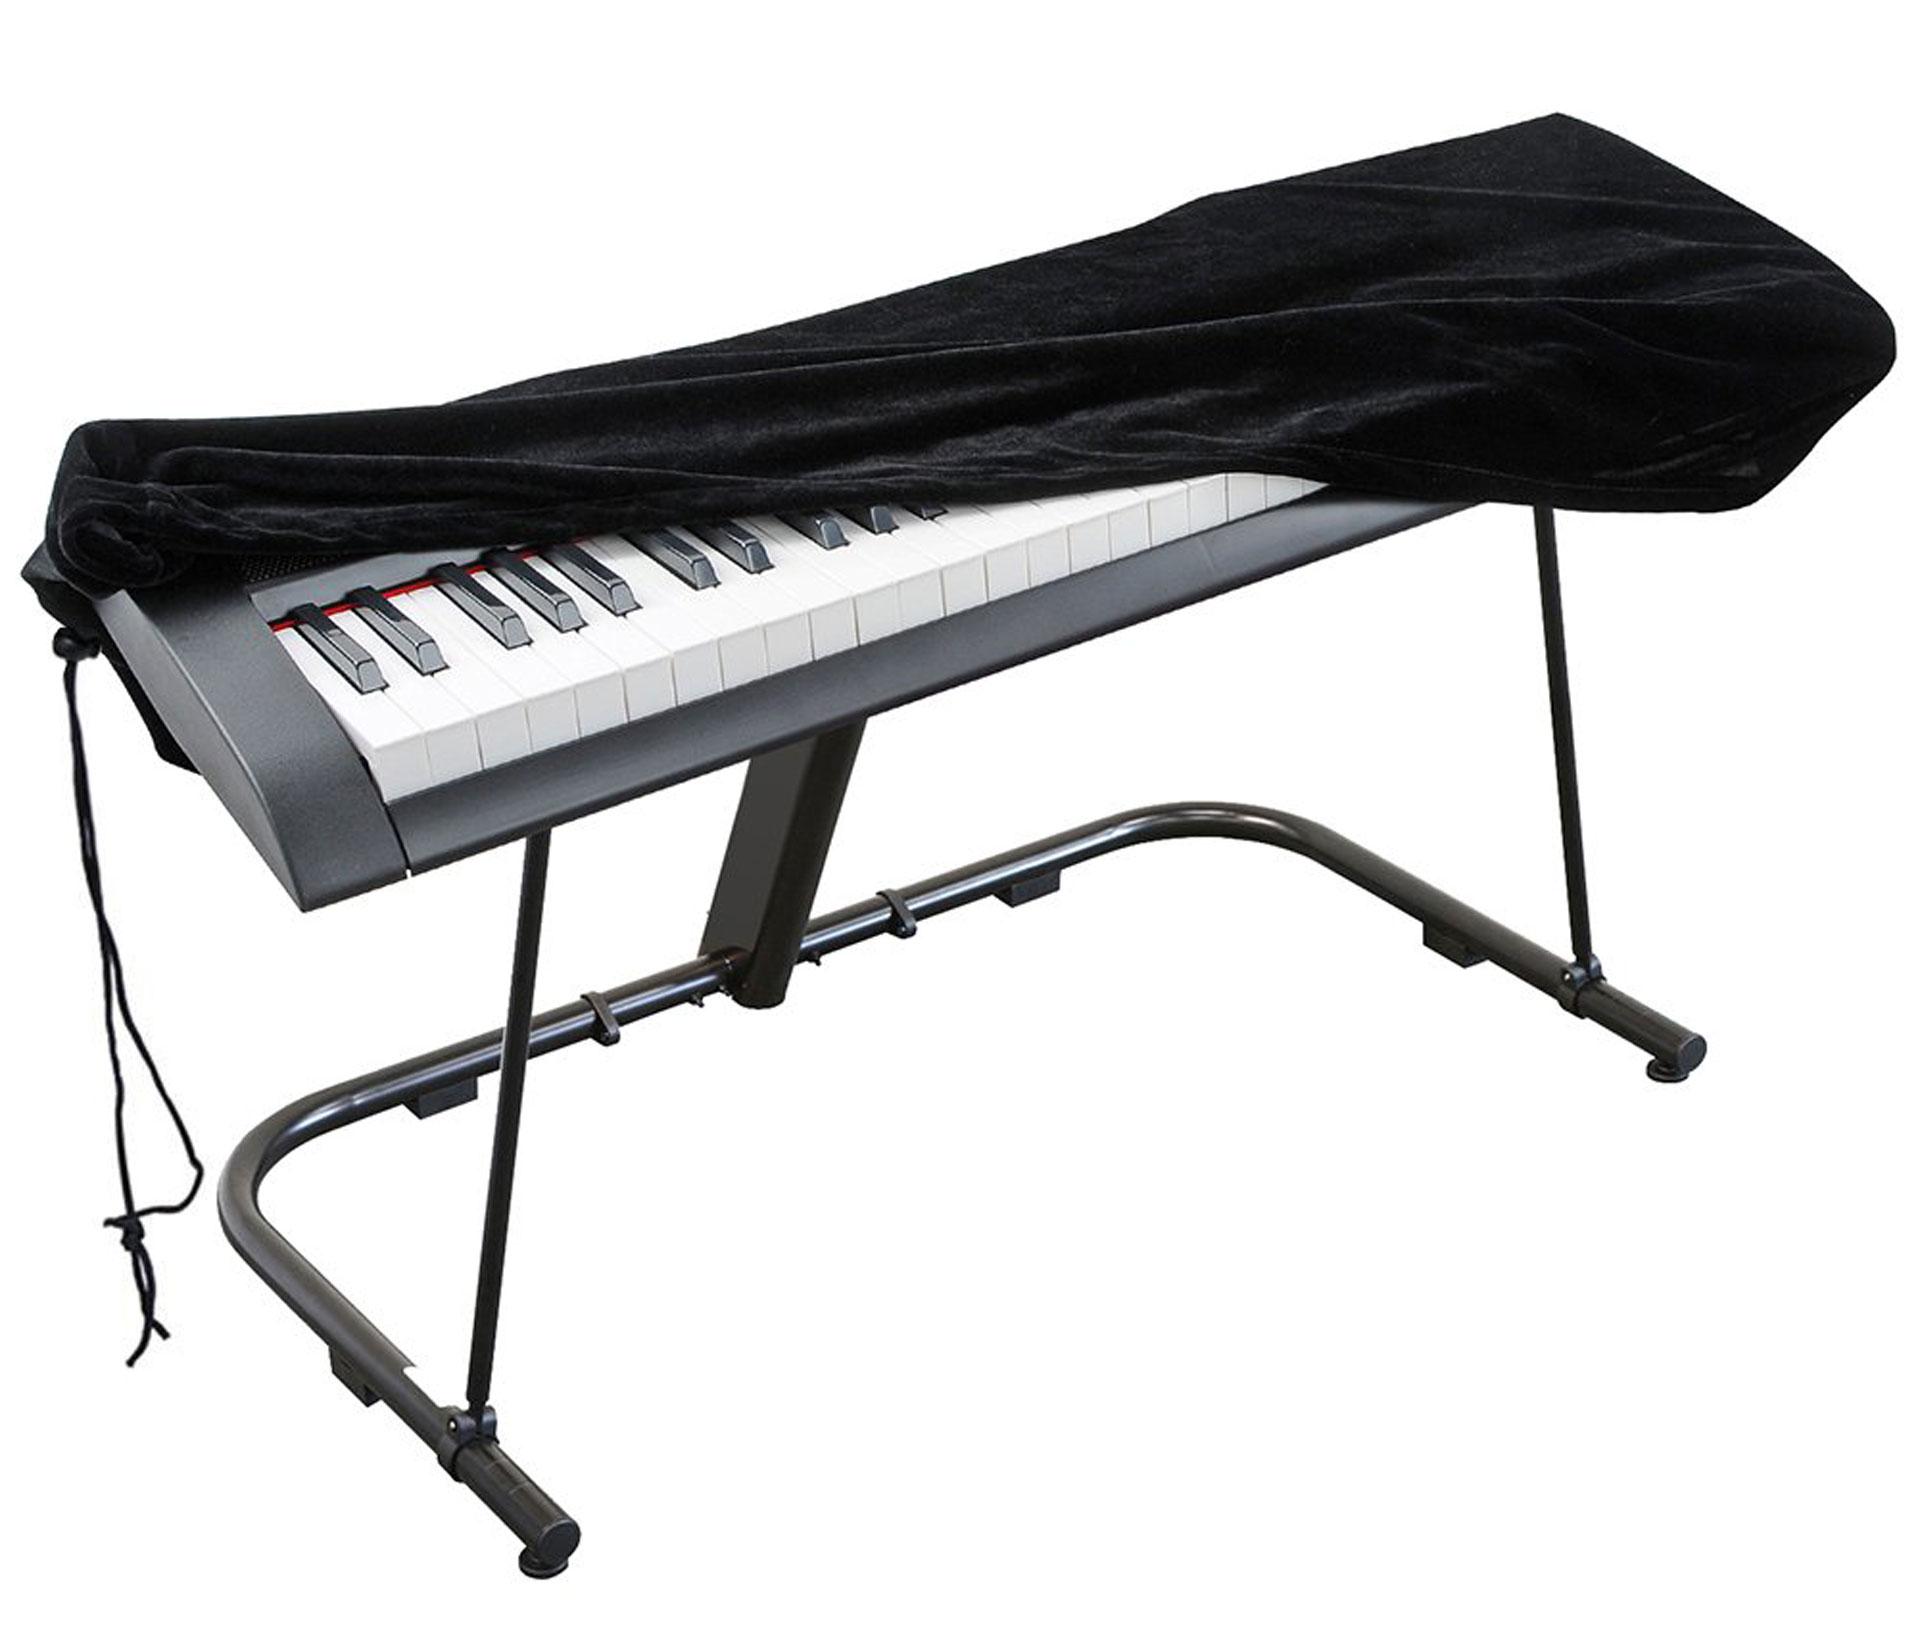 Klavierabdeckung Elektronische Klavier 88 Tasten Klavier Abdeckung